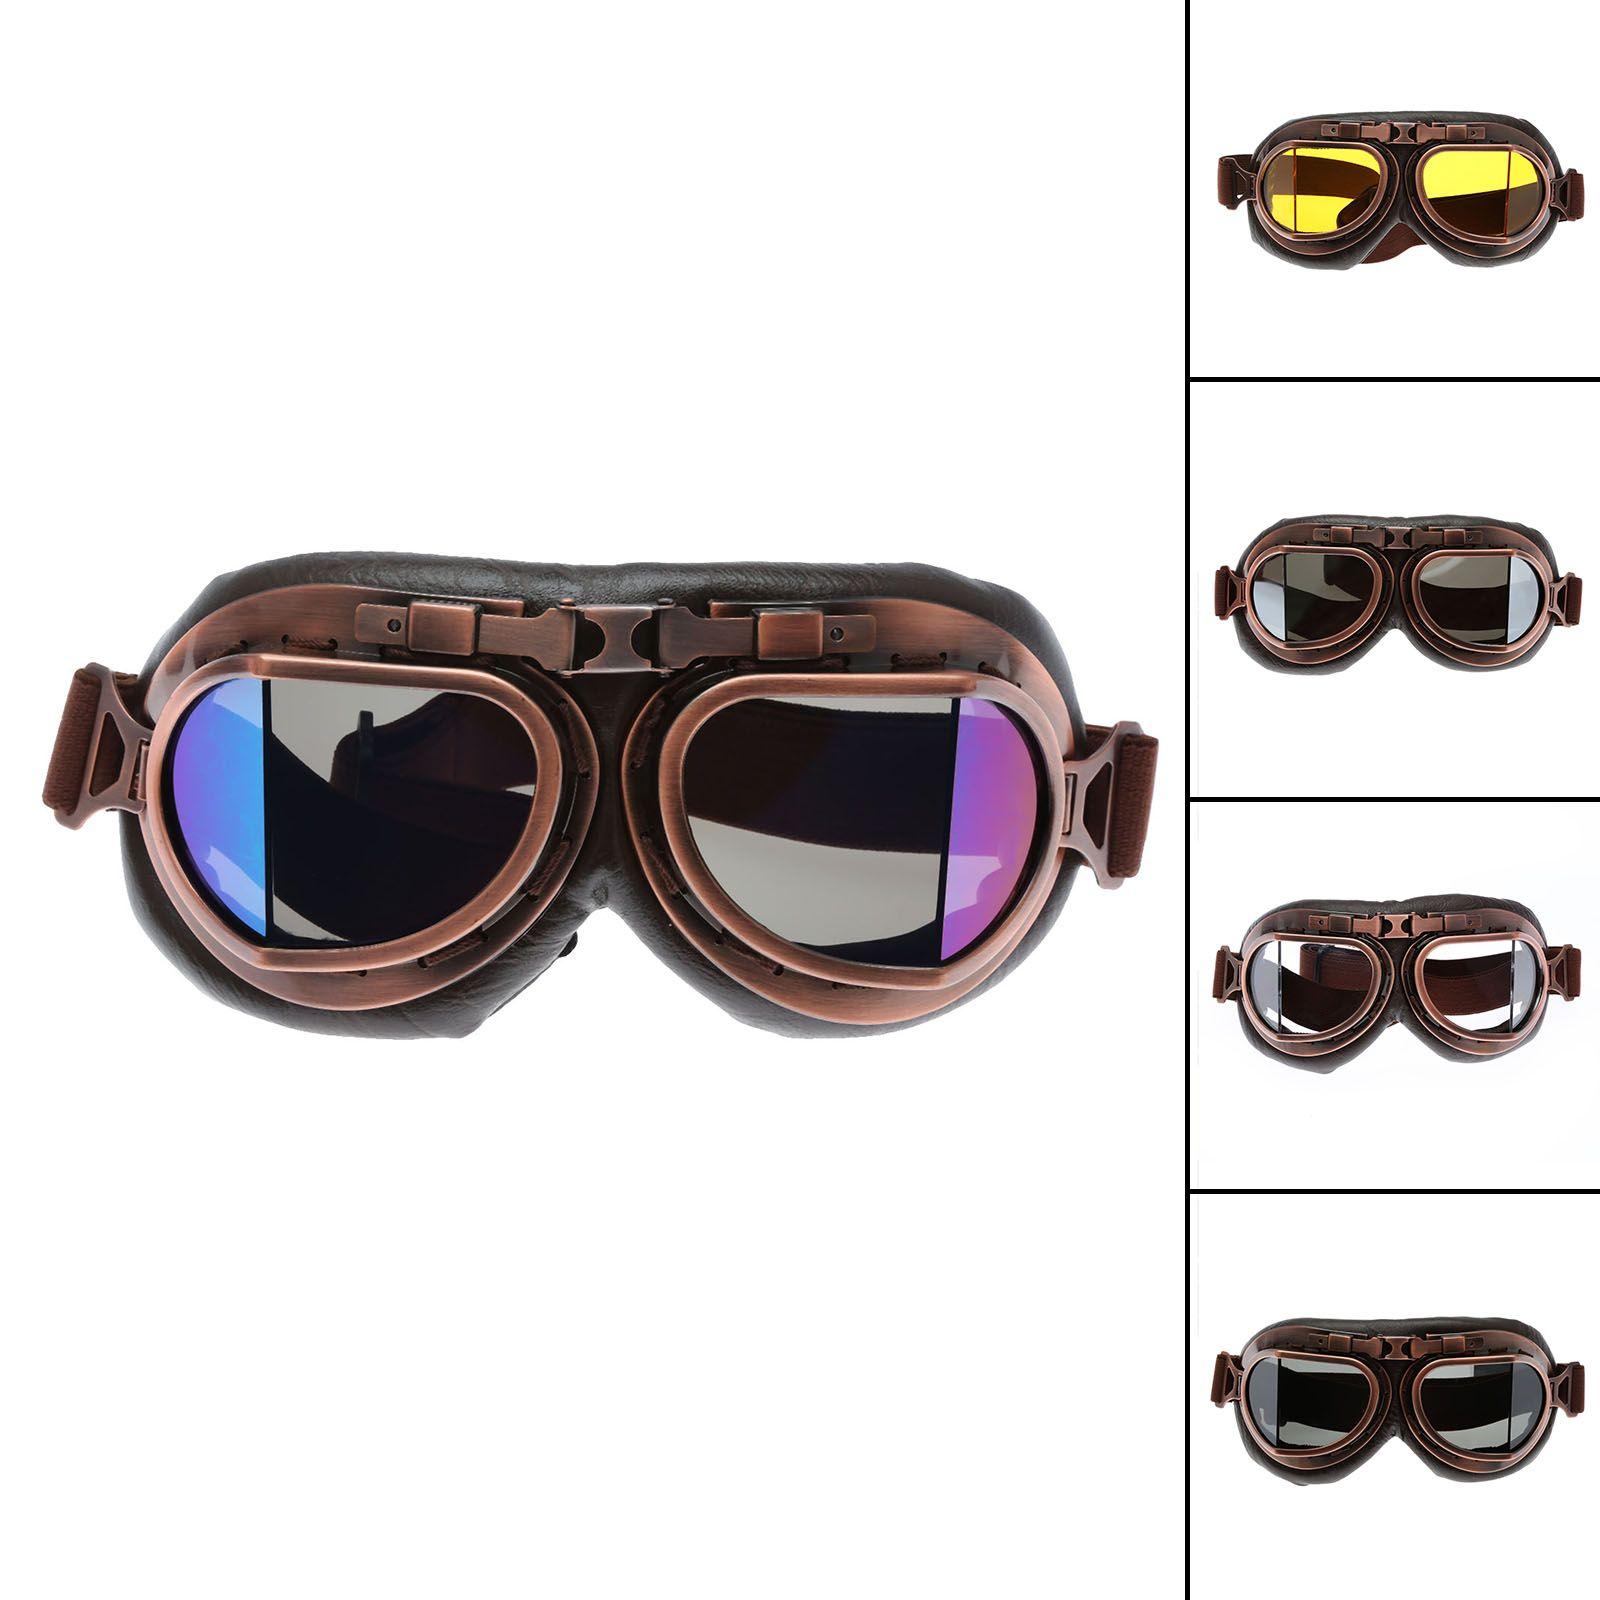 Motorcycle Goggles Glasses <font><b>Vintage</b></font> Motocross Classic Goggles Retro Aviator Pilot Cruiser Steampunk ATV Bike UV Protection Copper